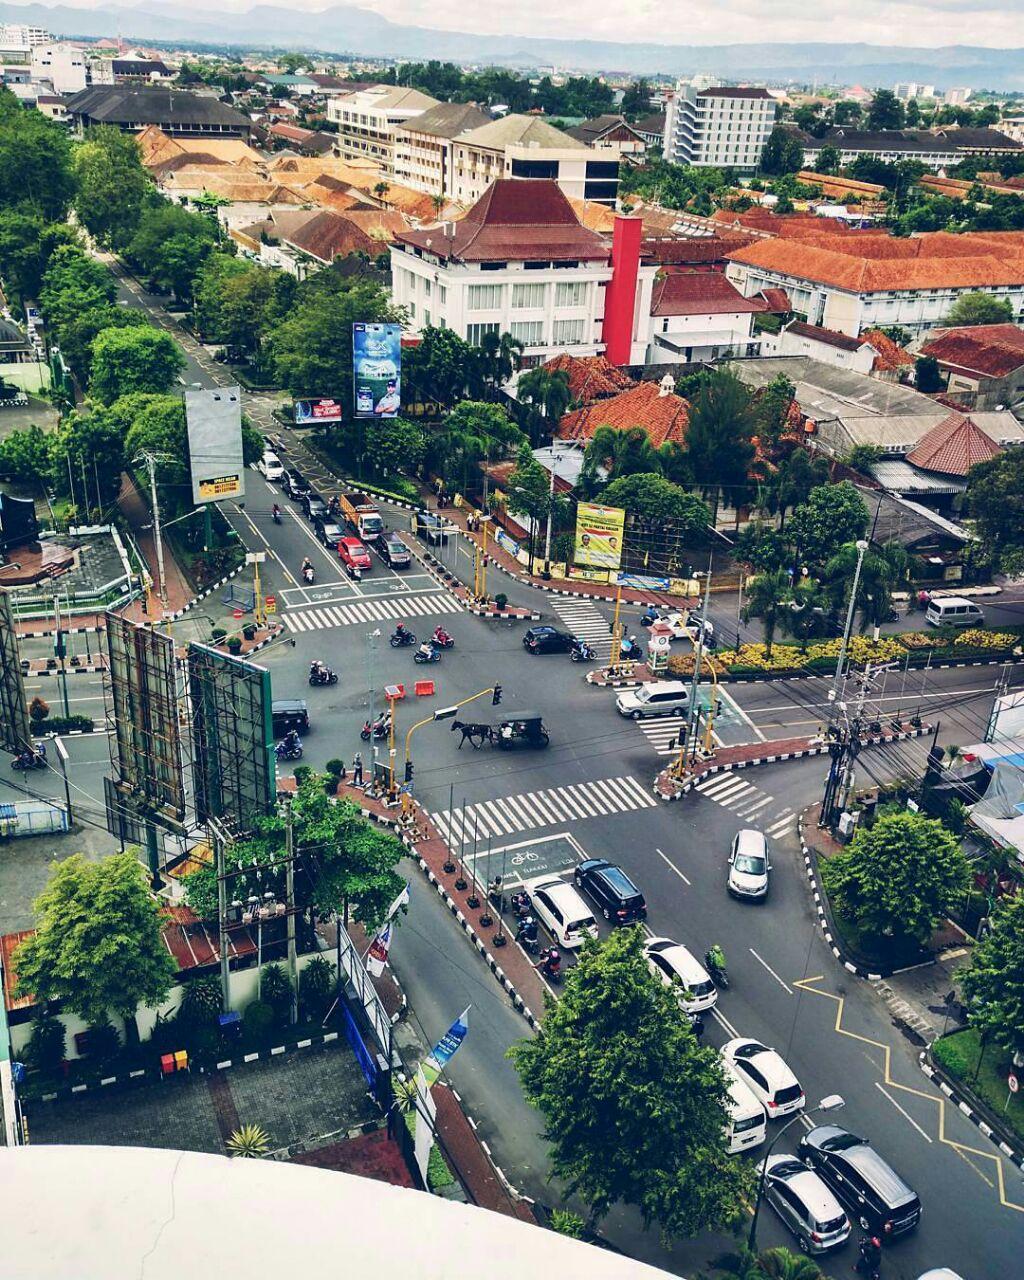 3 Penginapan Murah di Jogja Harga di Bawah 100 ribuan Free Wifi